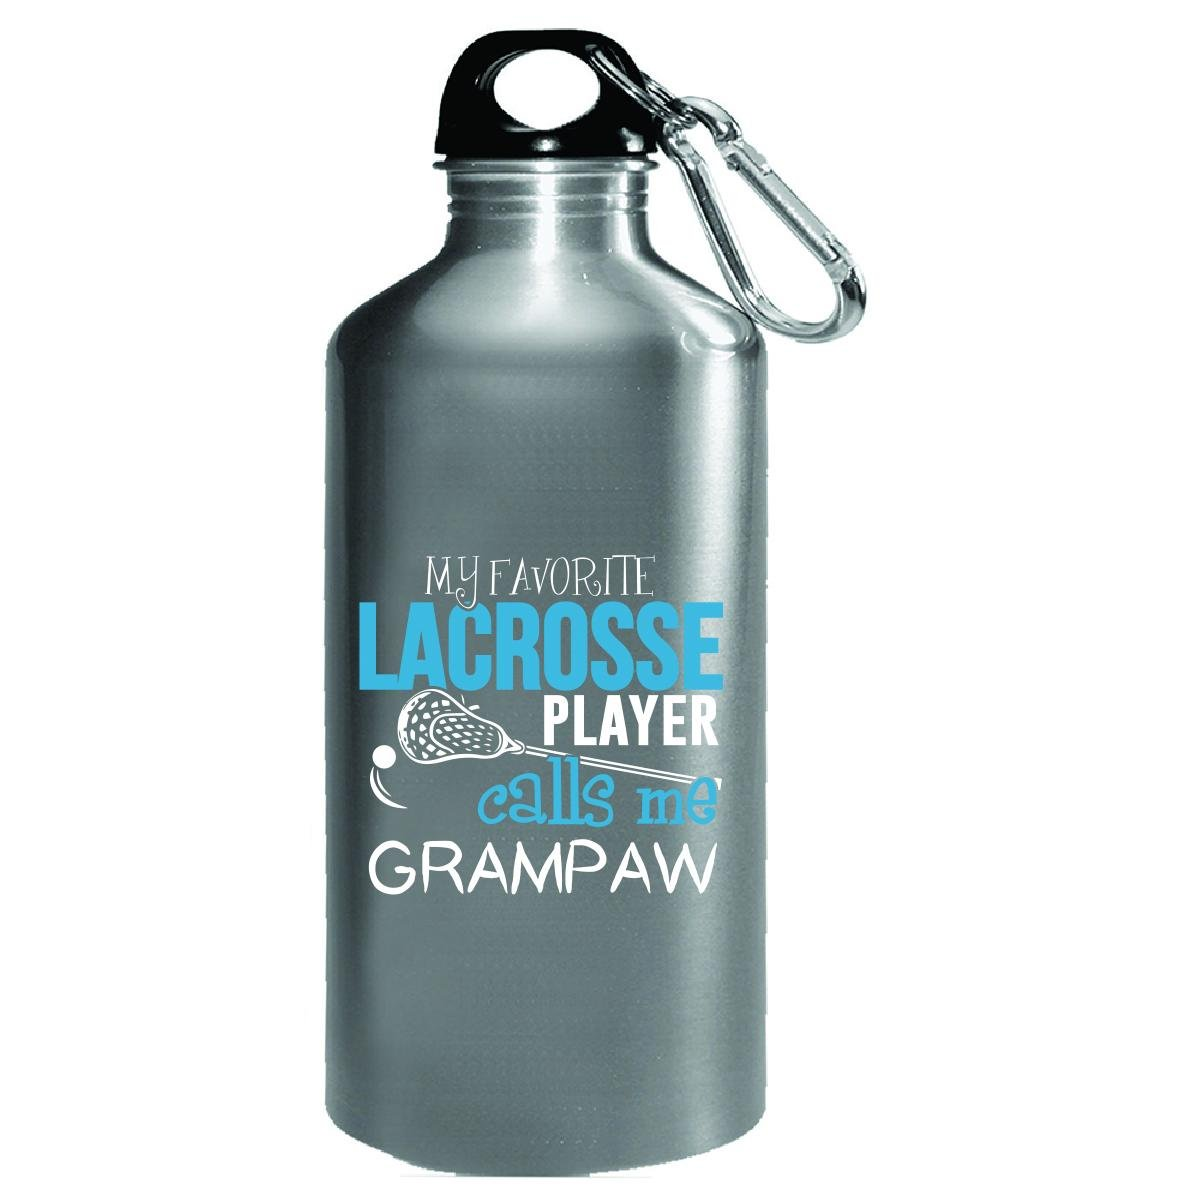 My Favorite Lacrosse Player Calls Me Grandpa Grampaw - Water Bottle